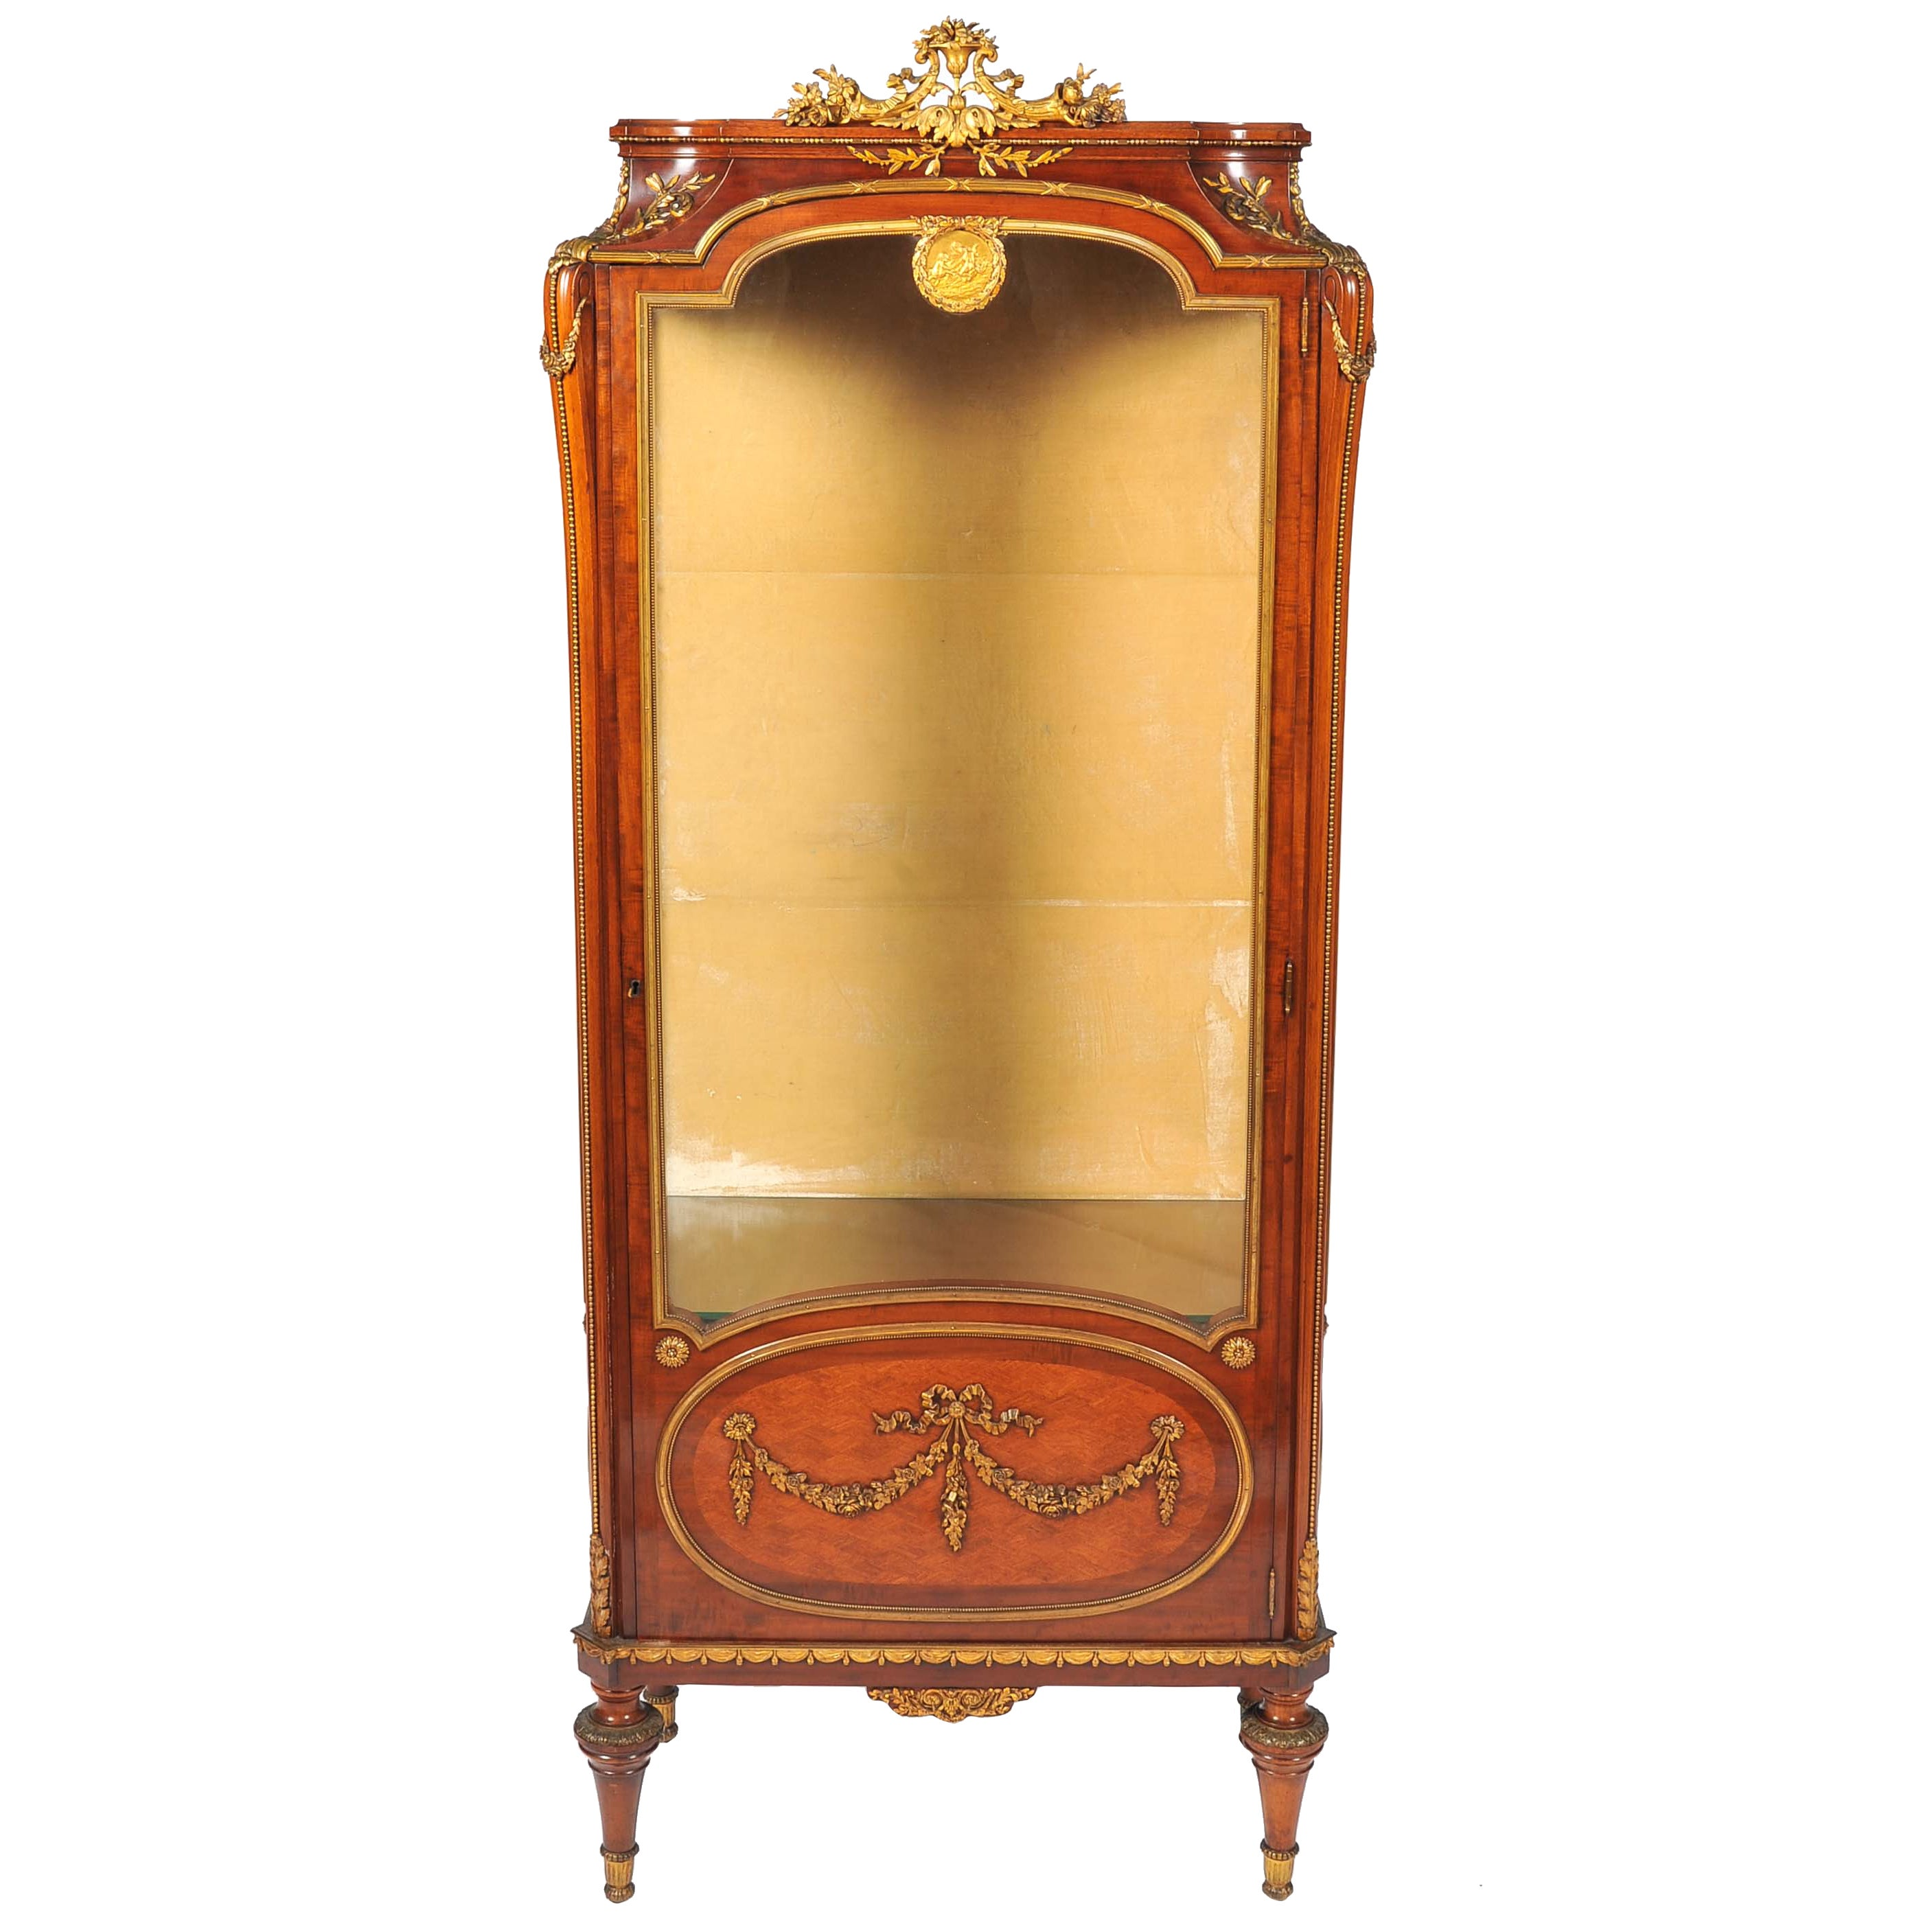 Louis XVI Style Vitrine or Display Cabinet